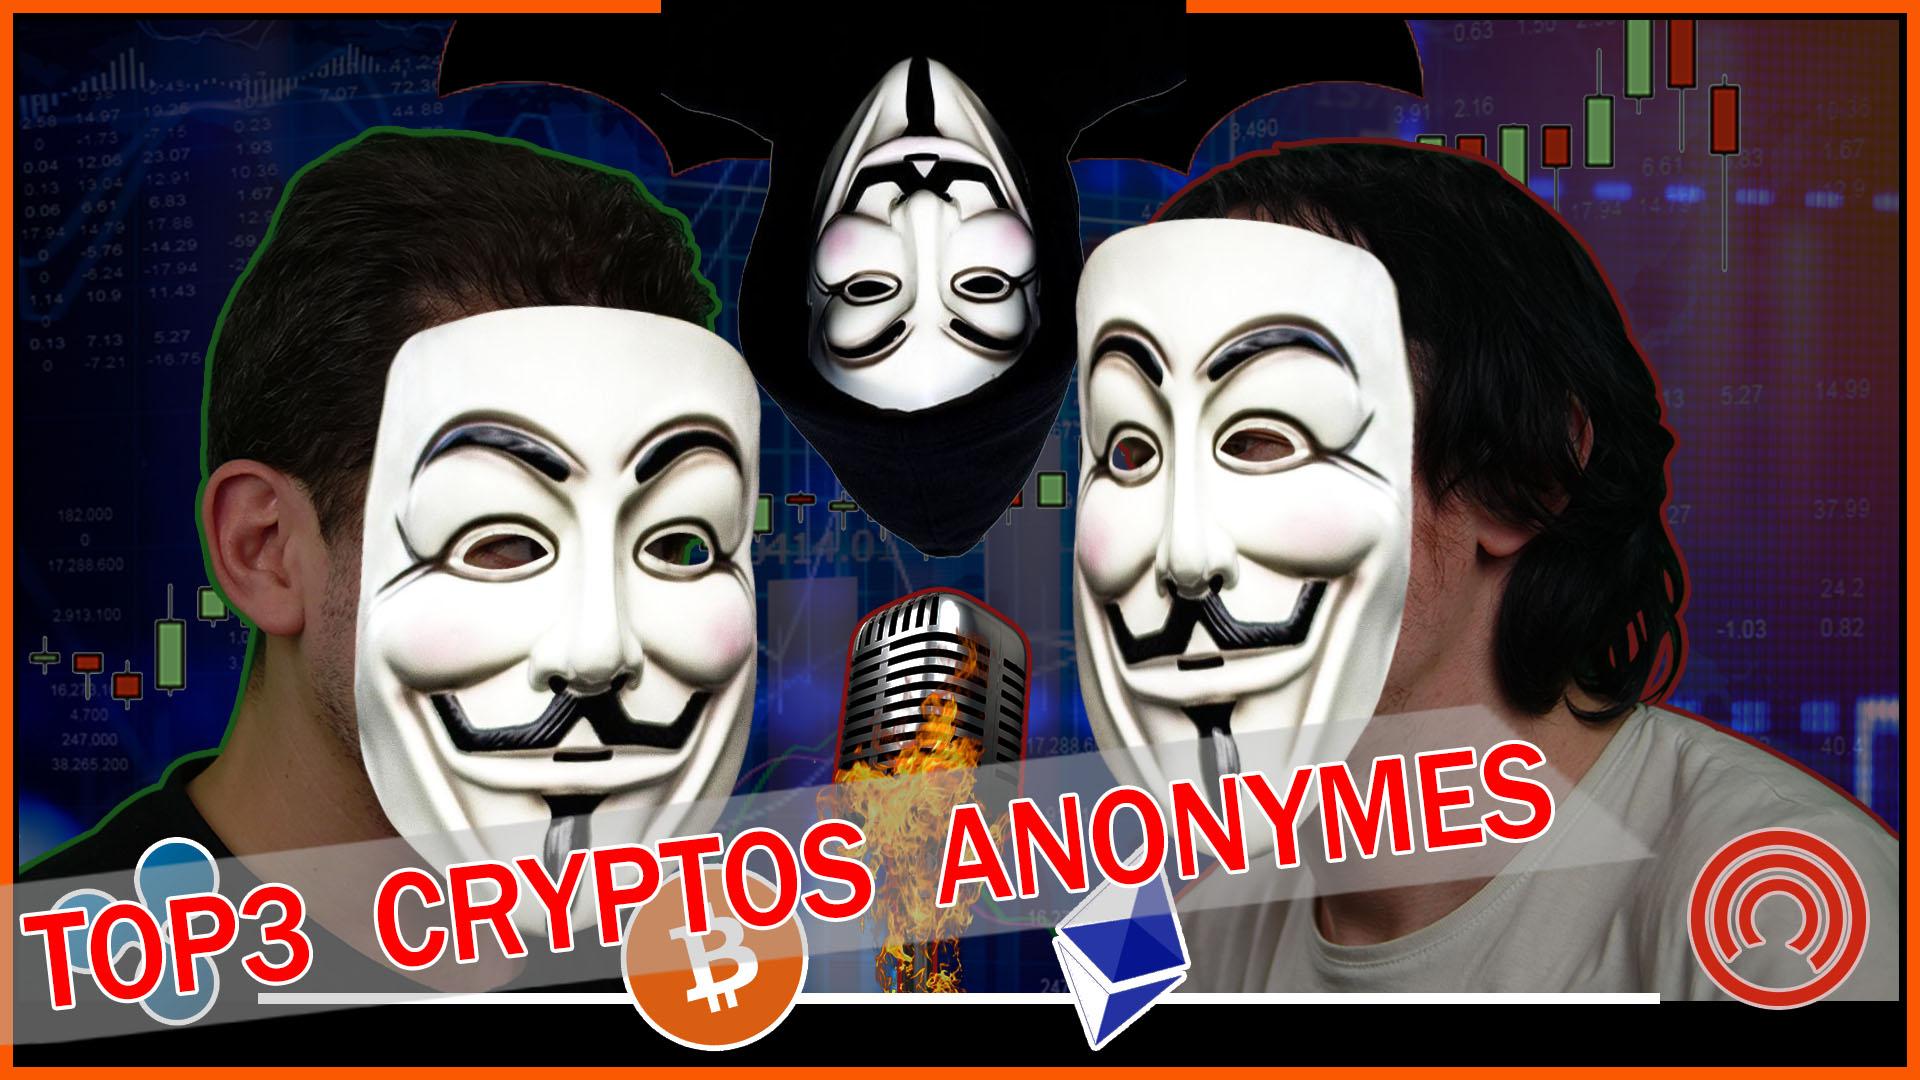 Top3 Cryptomonnaies Anonymes 2018